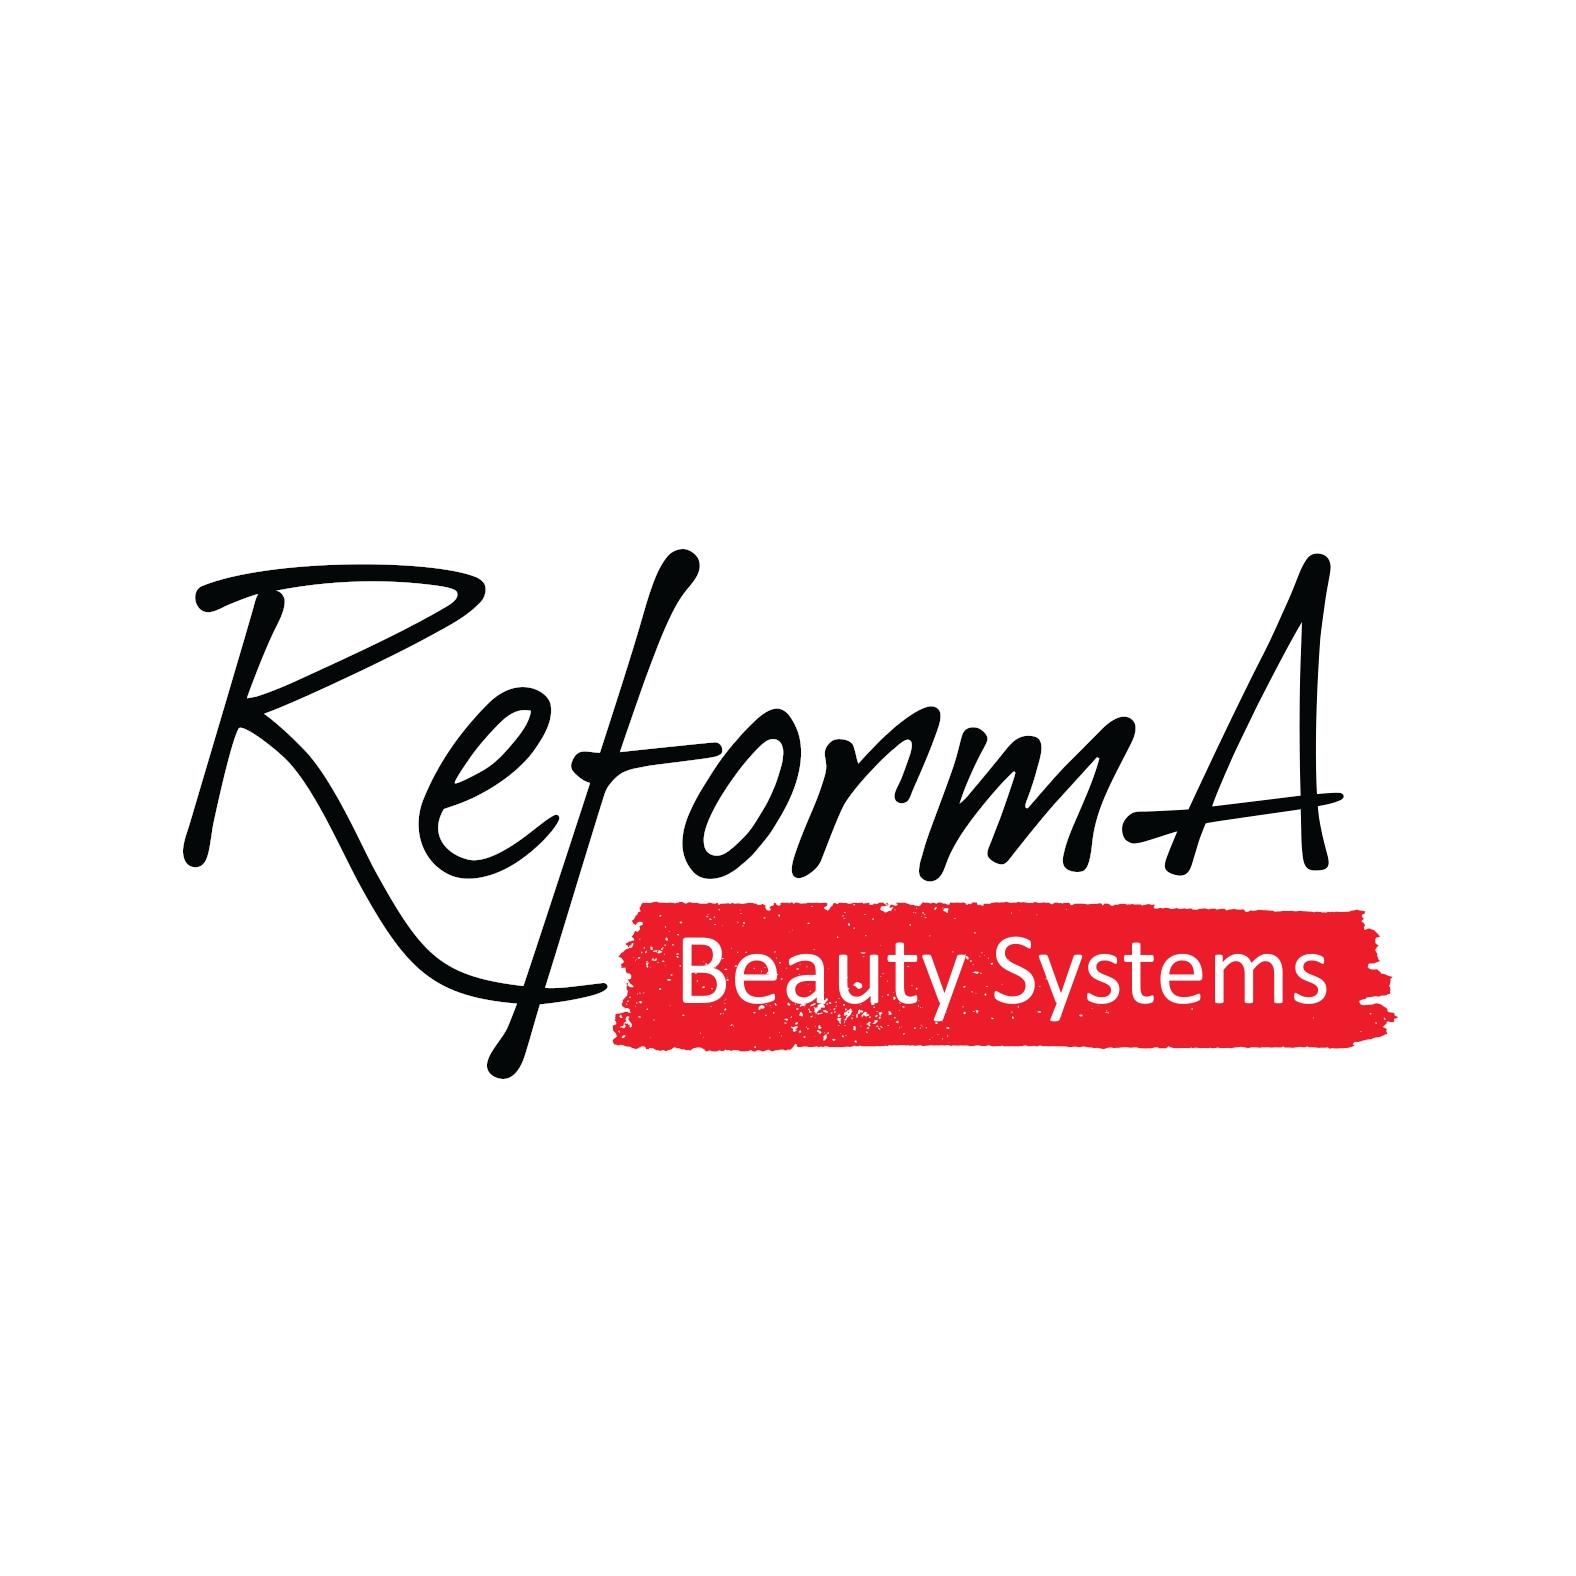 Maska Ochronna do włosów farbowanych, 200ml